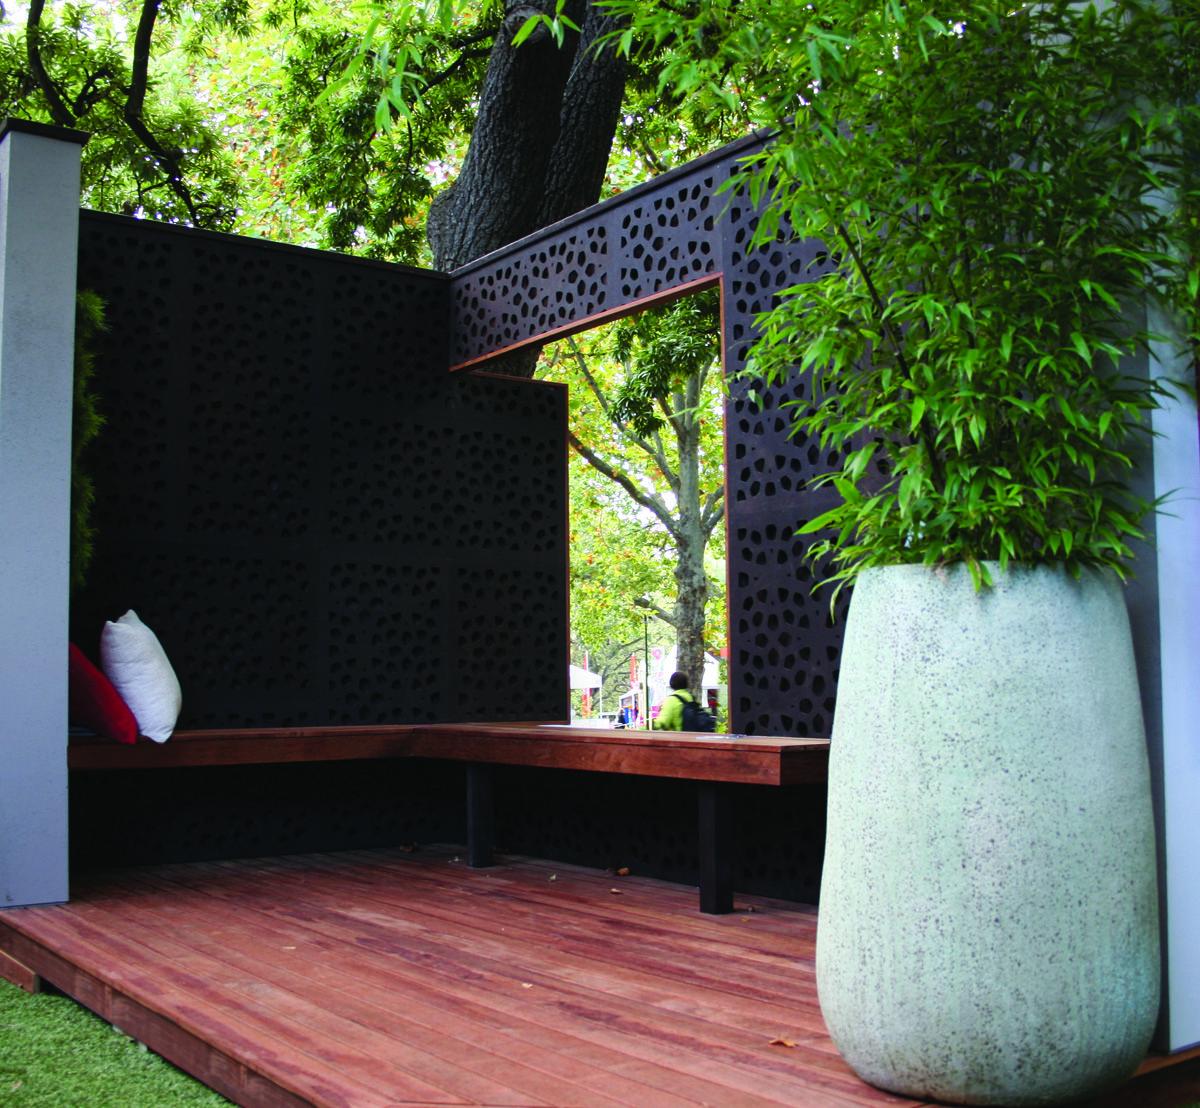 Marakesh Design 1200 mm(H) x 600 mm(W) Panels. 80% Privacy/ Blockout ...